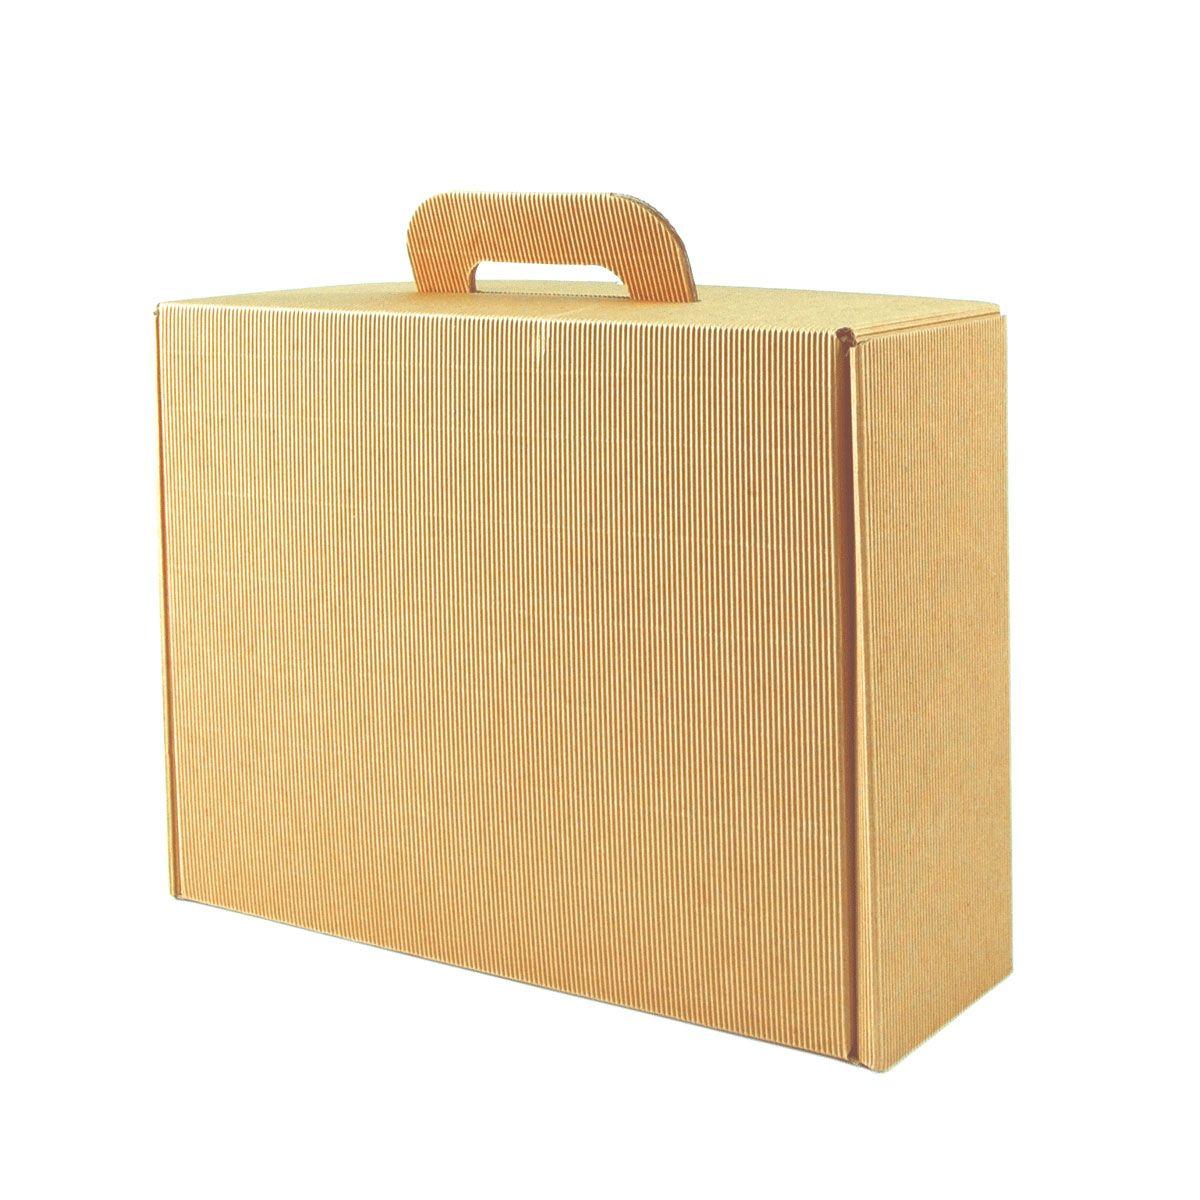 Cardboard Suitcase Google Search Cardboard No Way